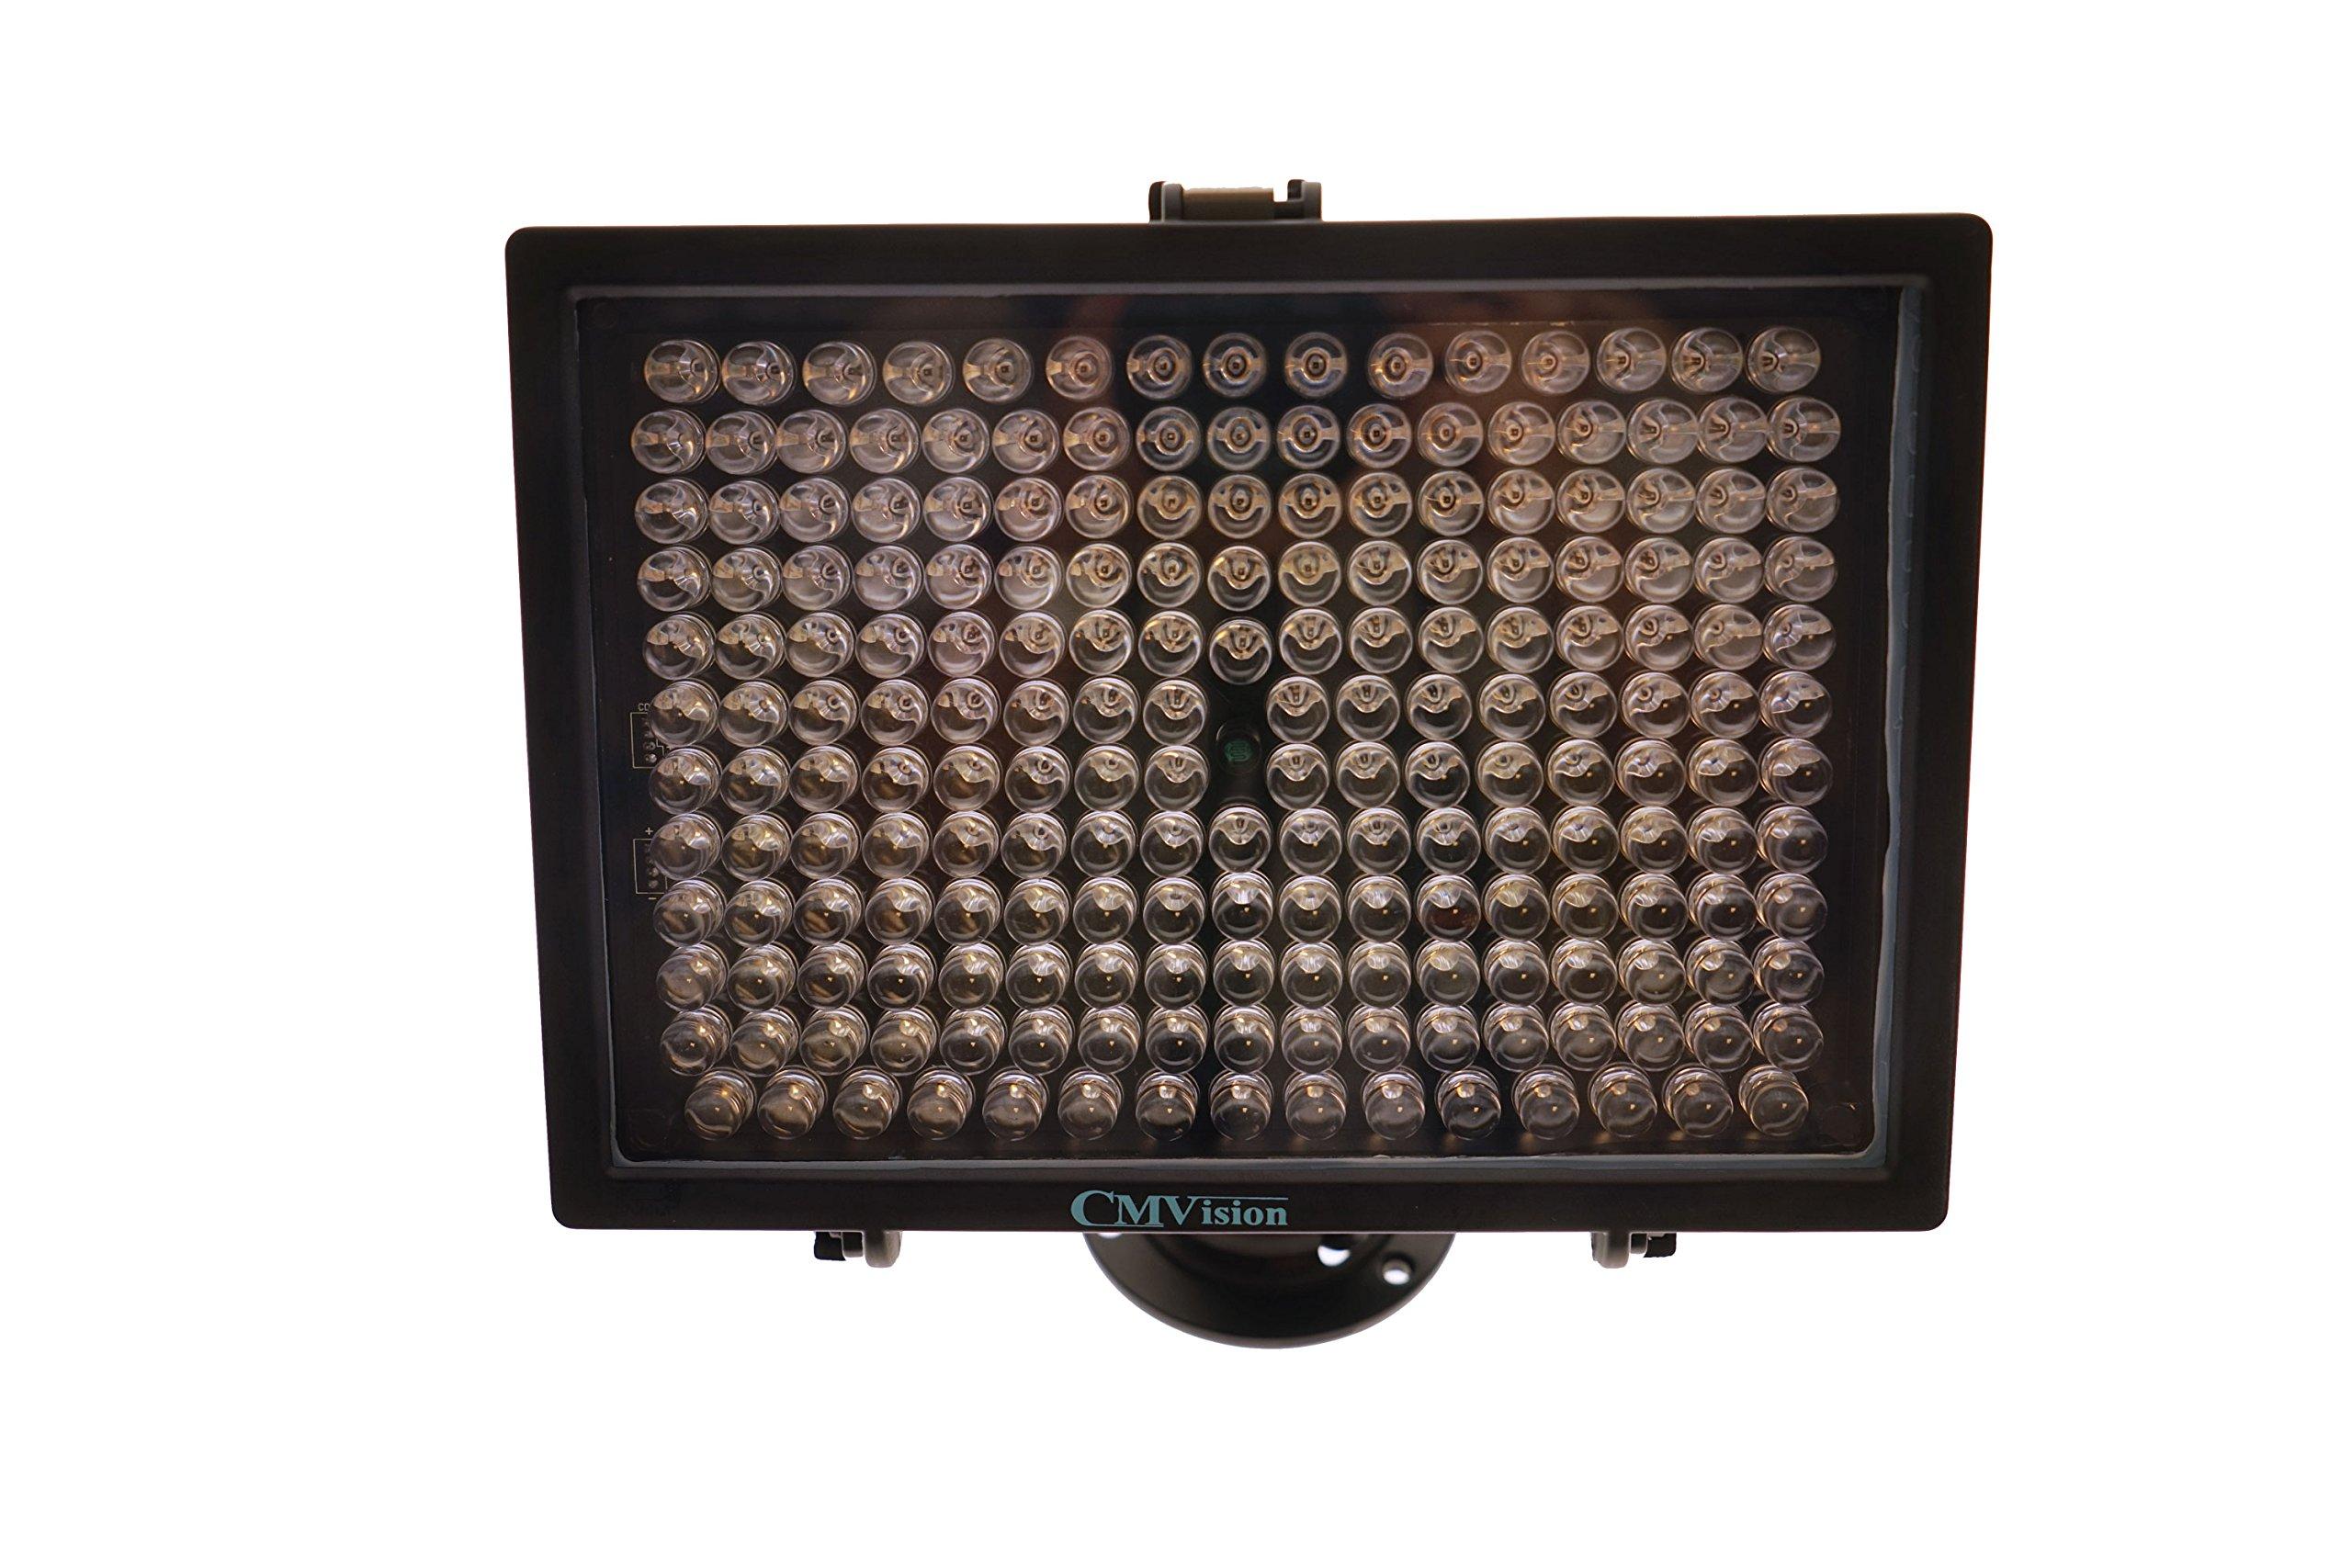 CMVision-IR200-198 IR LED Night Indoor/Outdoor Long Range 300ft IR Illuminator w/FREE 12V Power Adapter (Up & Down Position Adjustment only)